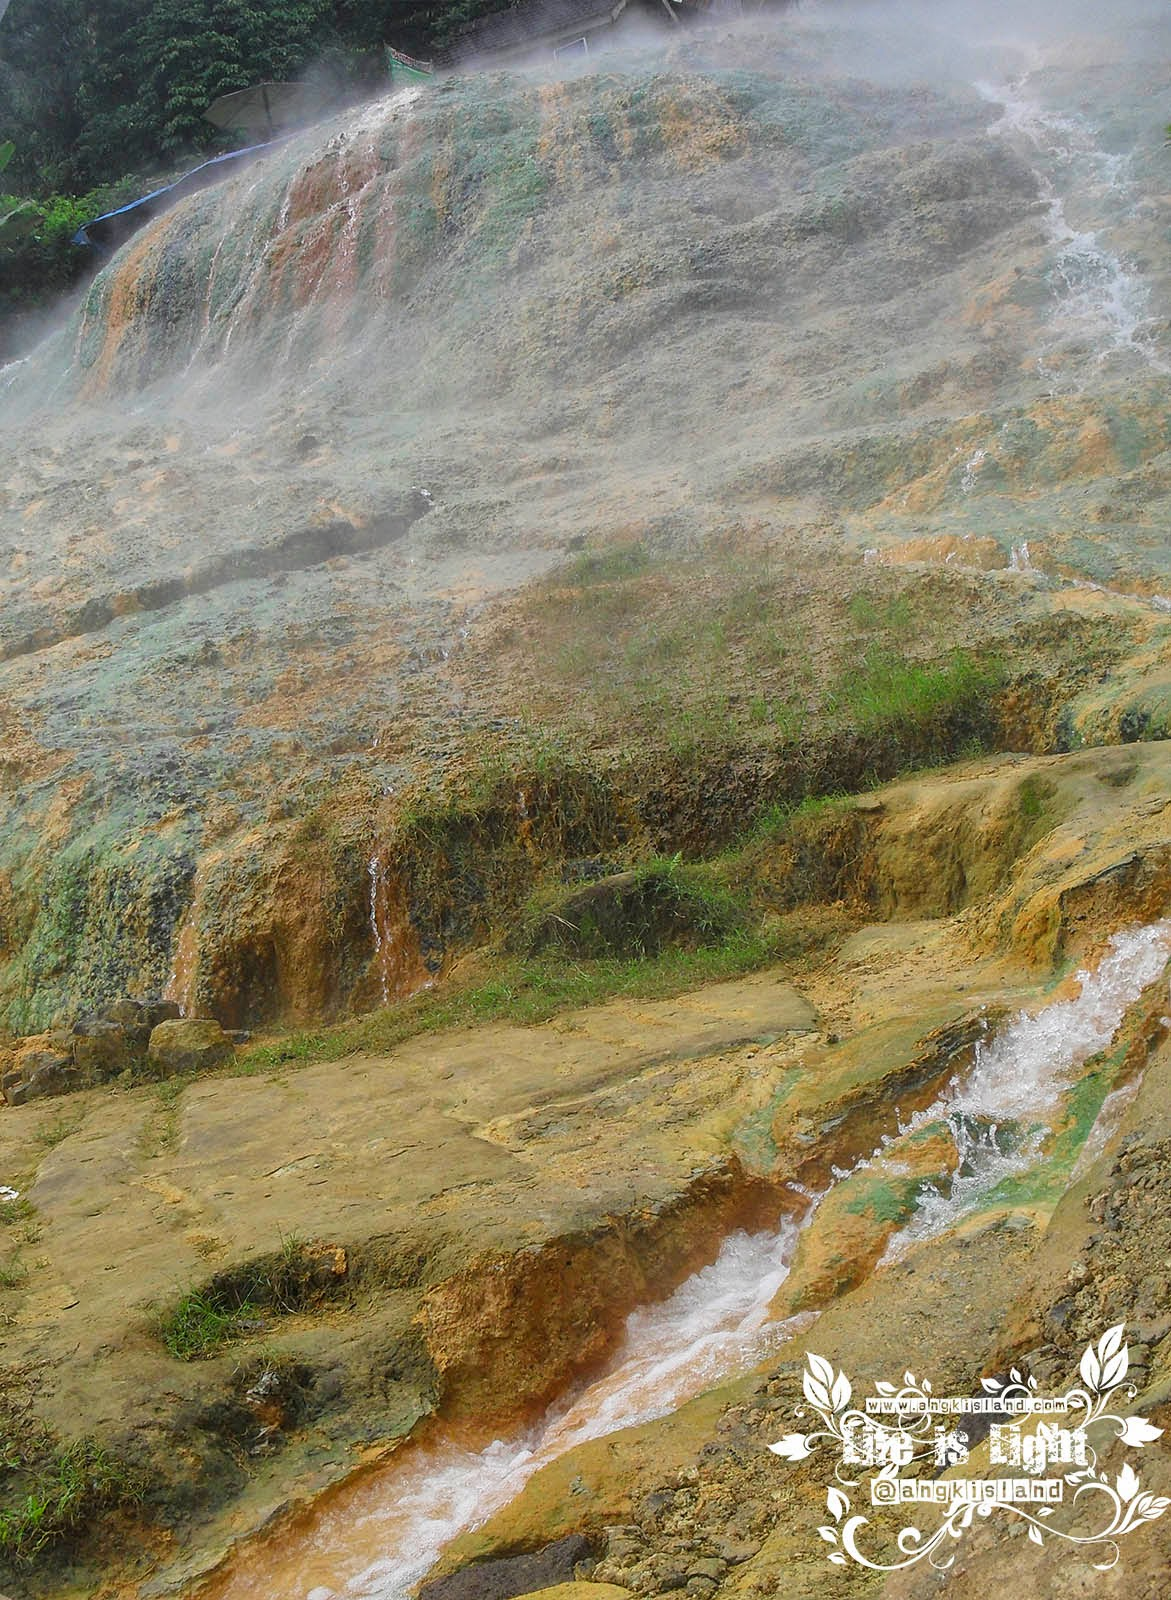 Air terjun Baturraden